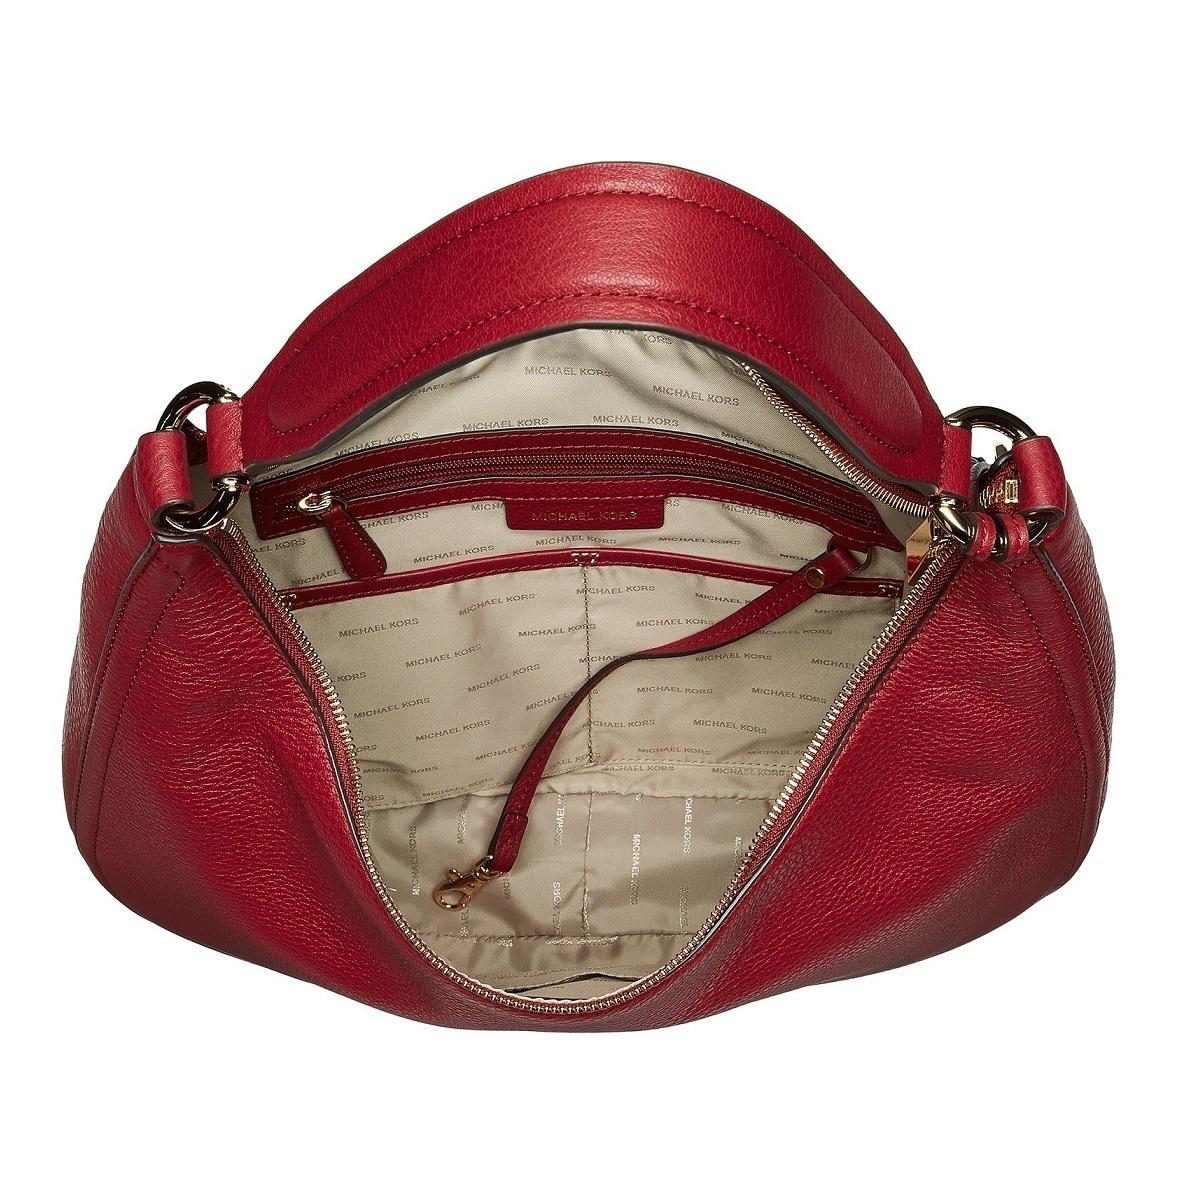 96d0b7dbce57 Shop Michael Kors Lydia Large Mulberry Hobo Handbag - Free Shipping Today -  Overstock - 20192400